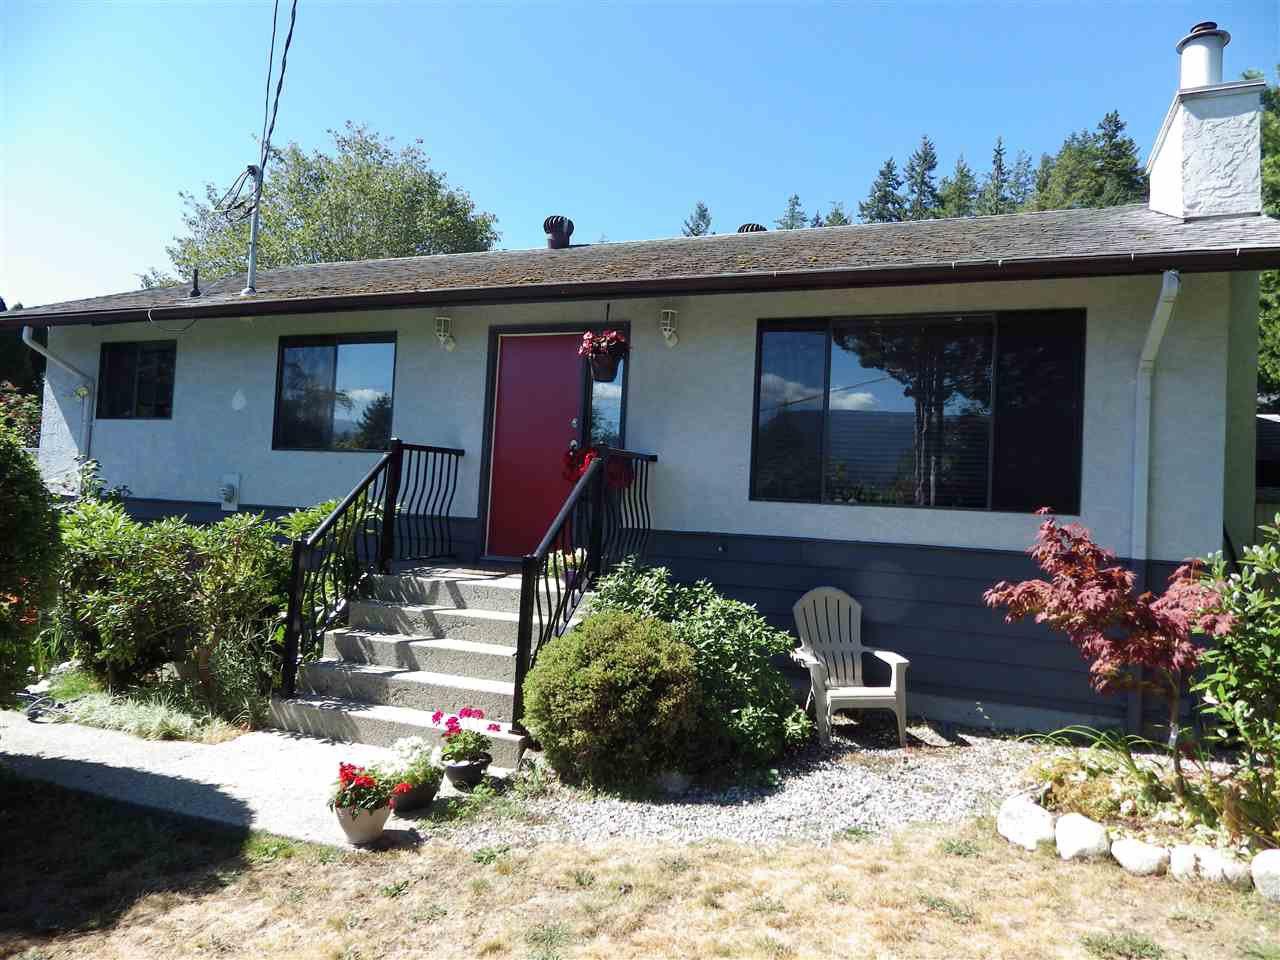 Main Photo: 5711 TRAIL Avenue in Sechelt: Sechelt District House for sale (Sunshine Coast)  : MLS®# R2194630